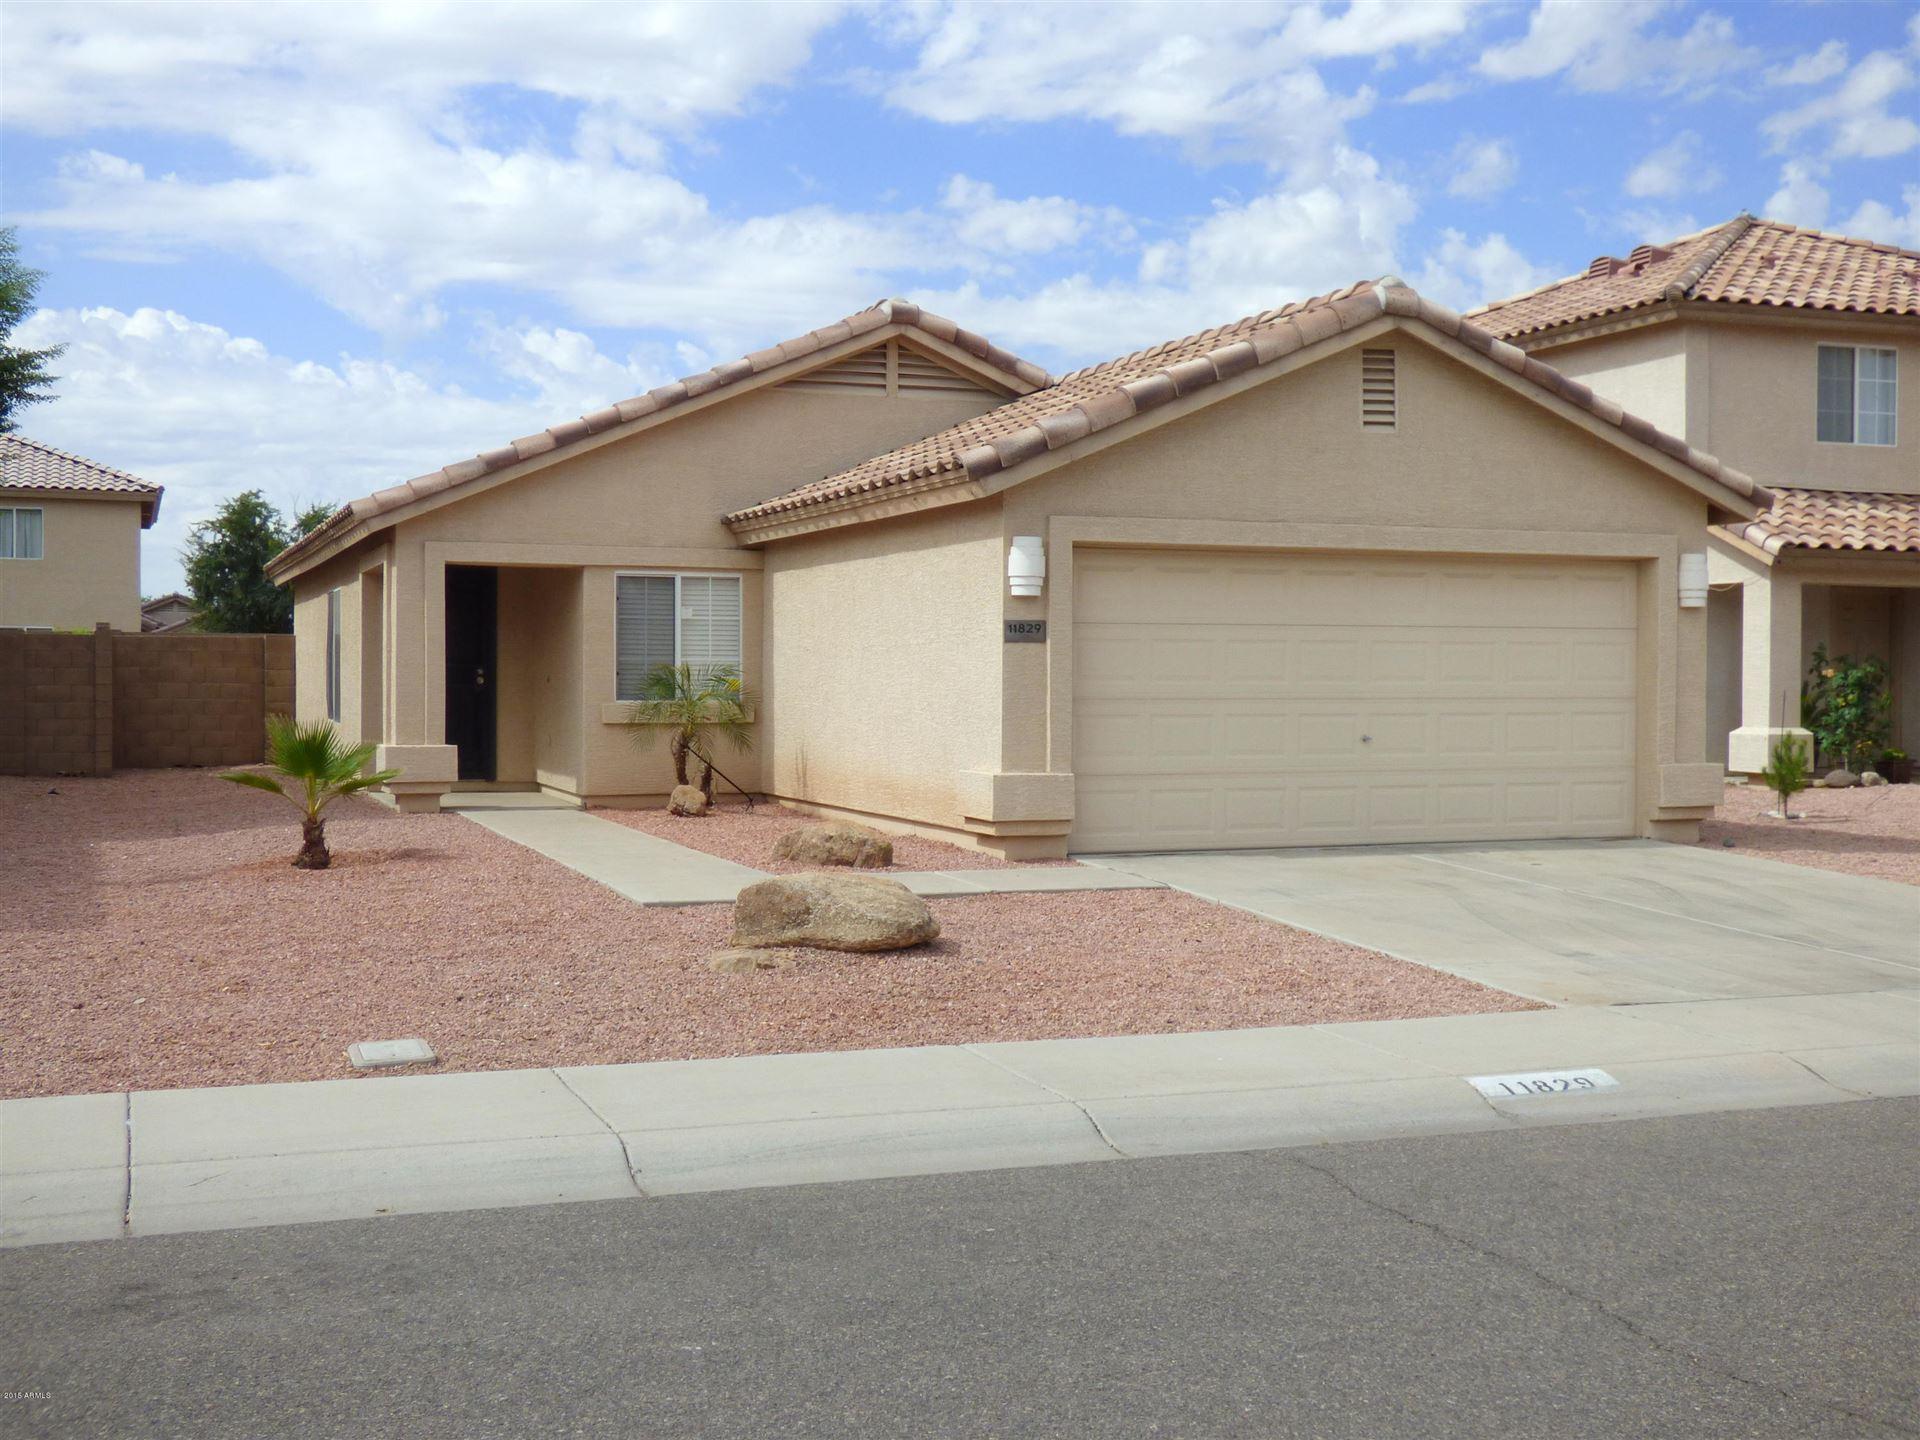 Photo of 11829 W Paradise Drive, El Mirage, AZ 85335 (MLS # 6228551)